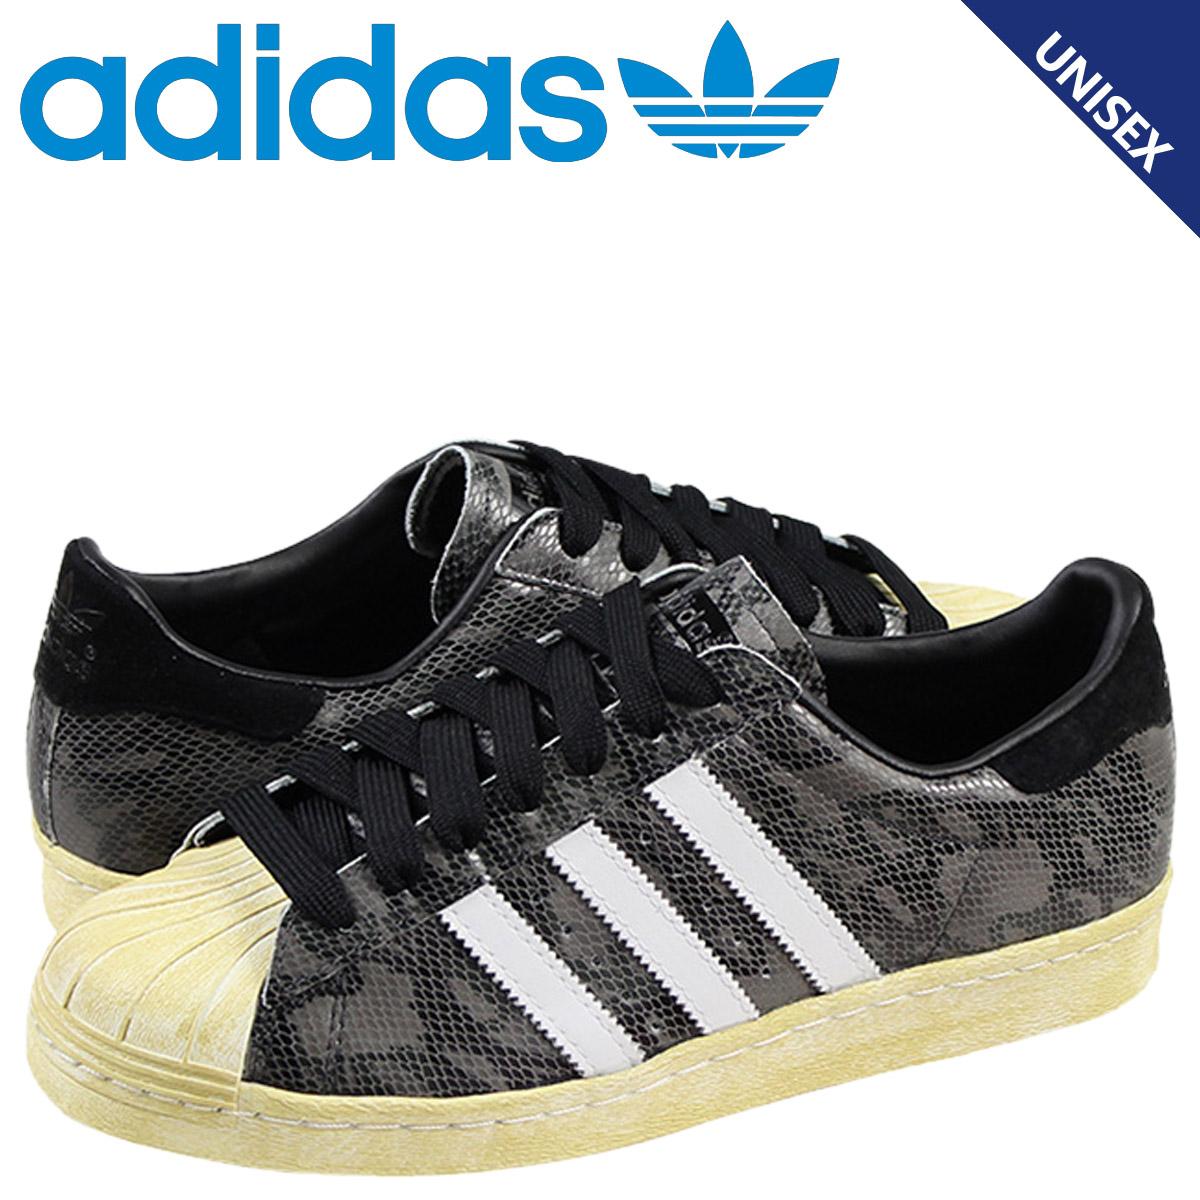 Point 2 x adidas originals adidas Originals SUPERSTAR 80S sneakers superstar 80S leather mens Womens G95846 Black Snake unisex [3 8 new in stock]